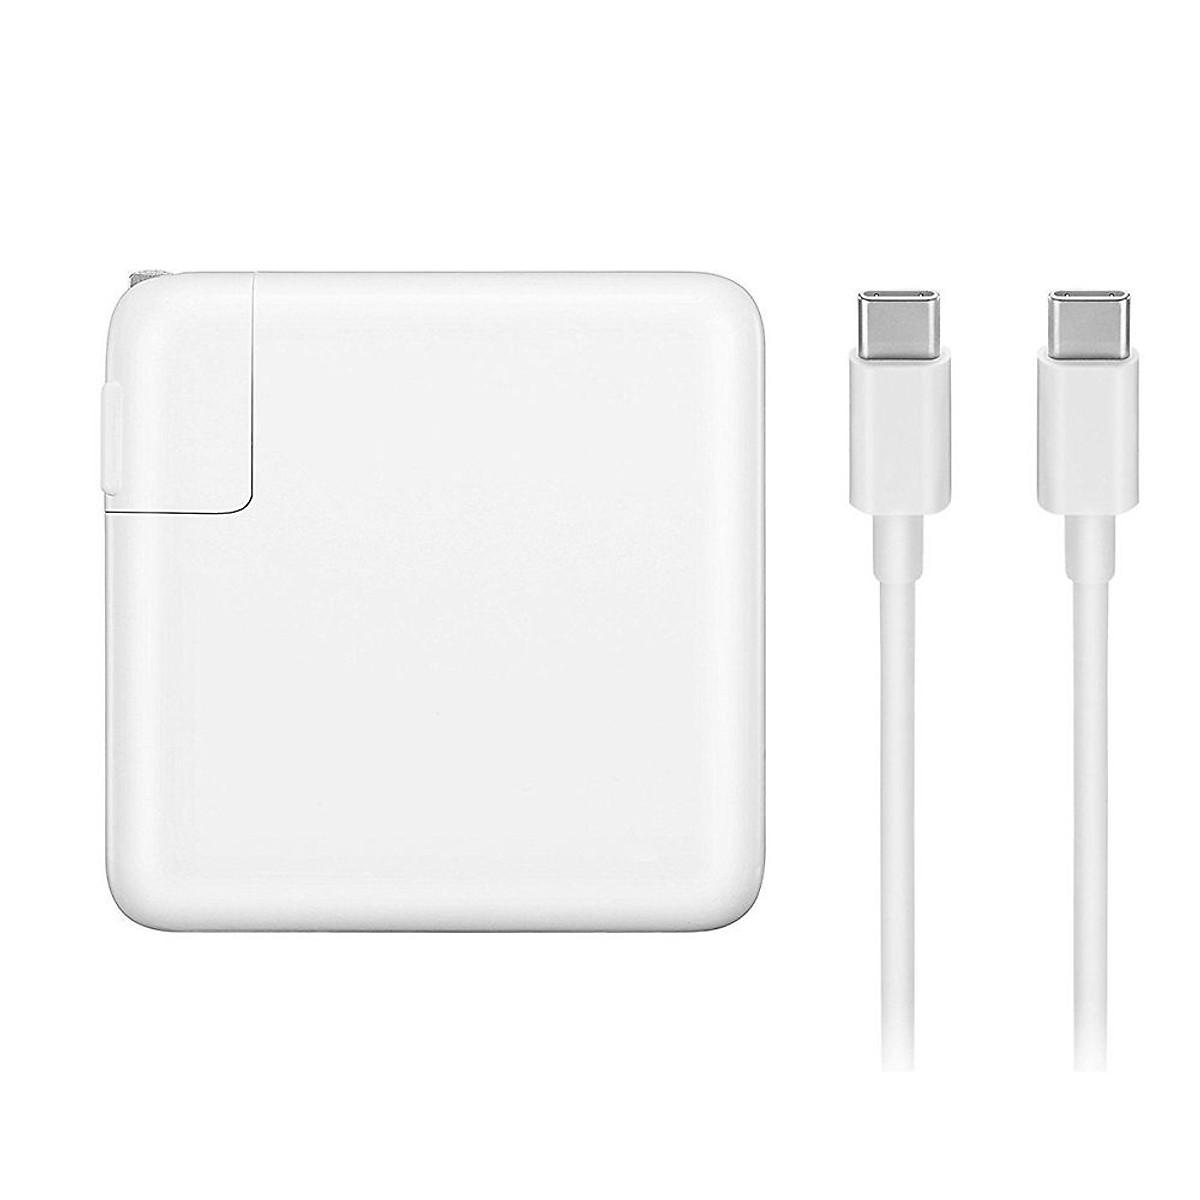 Sạc dành cho Apple Macbook Model A1540 – 29 Walt USB-C